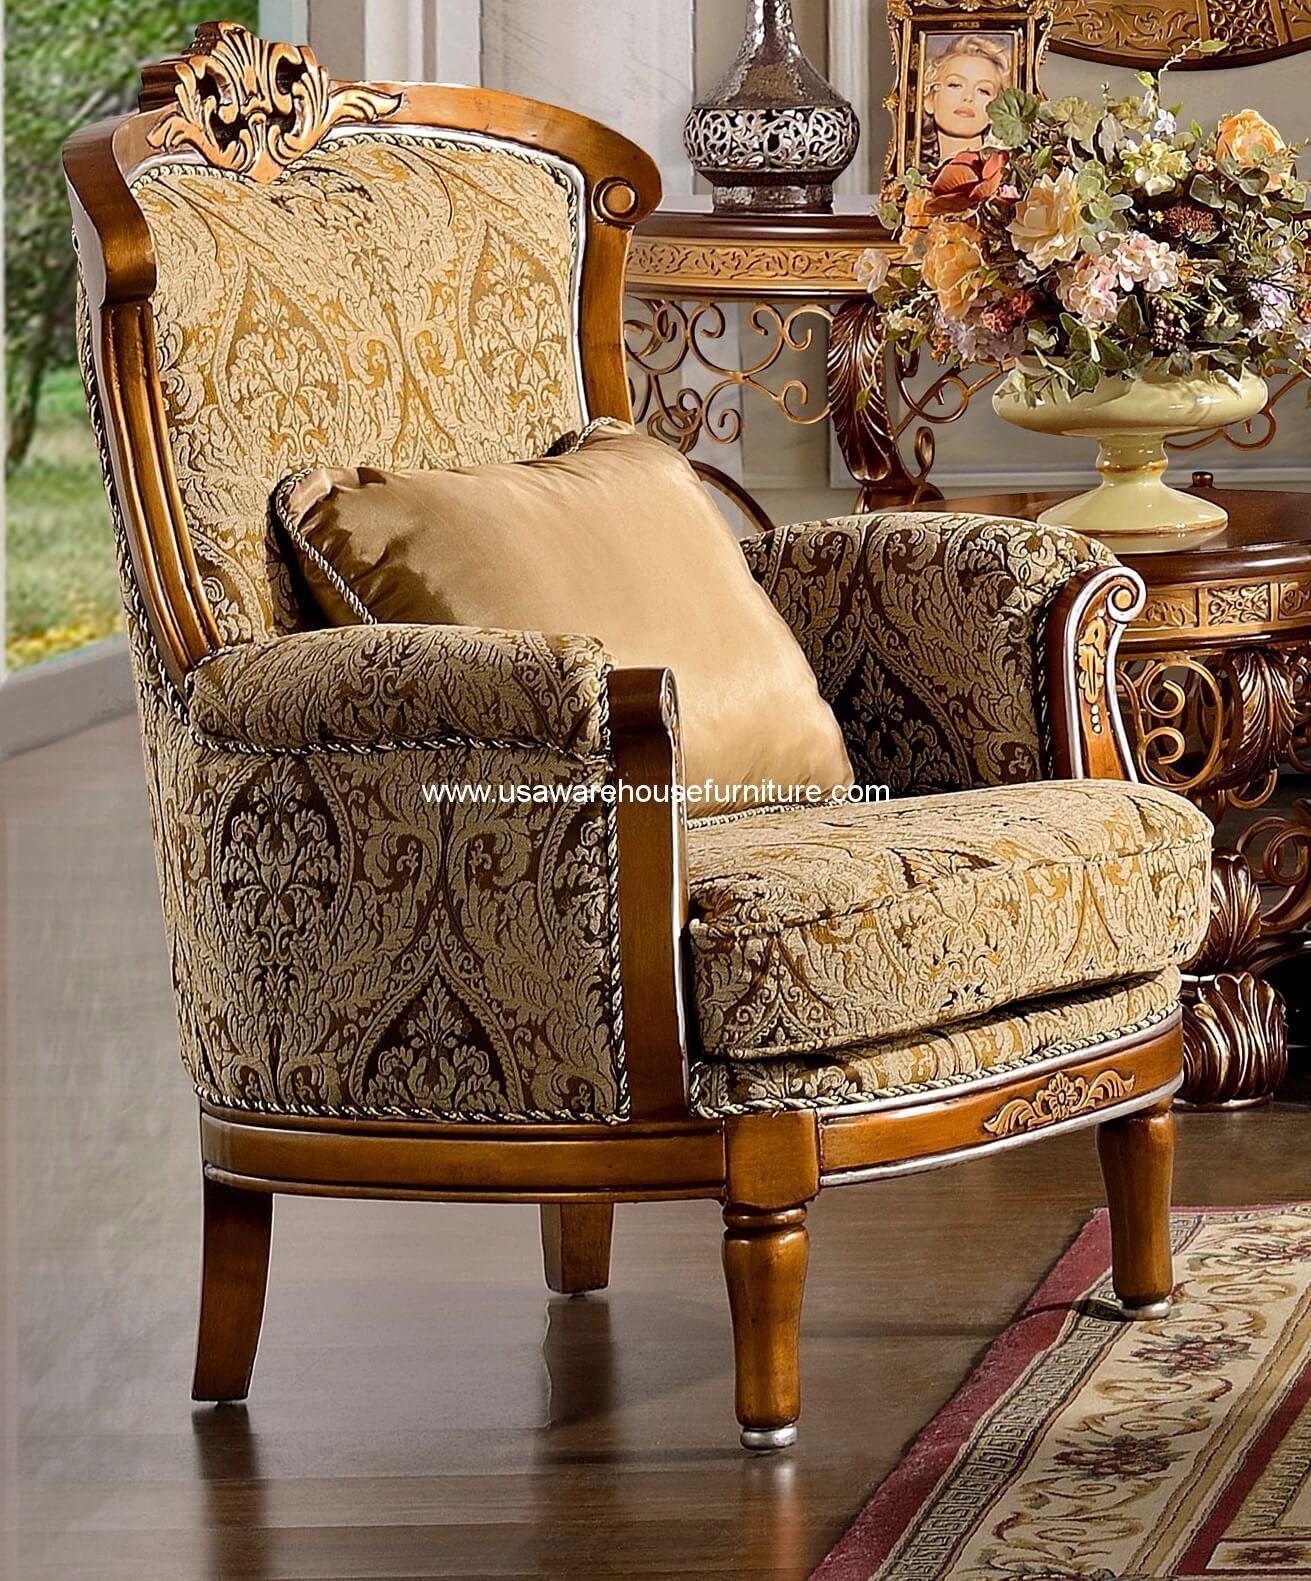 Homey Design Hd 369 Royal Chair Usa Warehouse Furniture